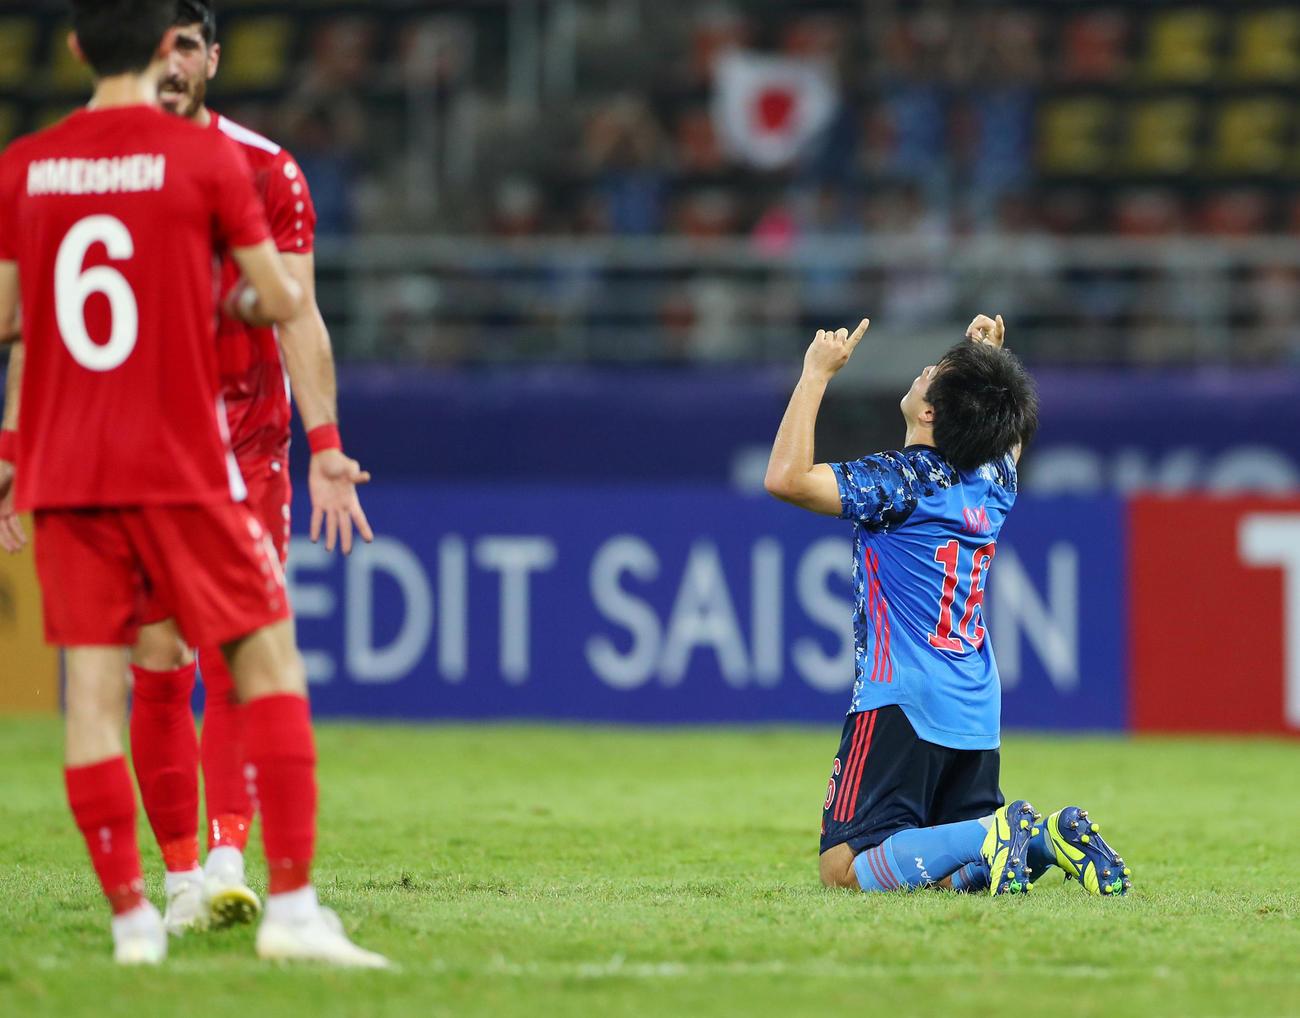 U-23アジア選手権のシリア戦で、同点ゴールを決め喜ぶ相馬(20年1月12日撮影)